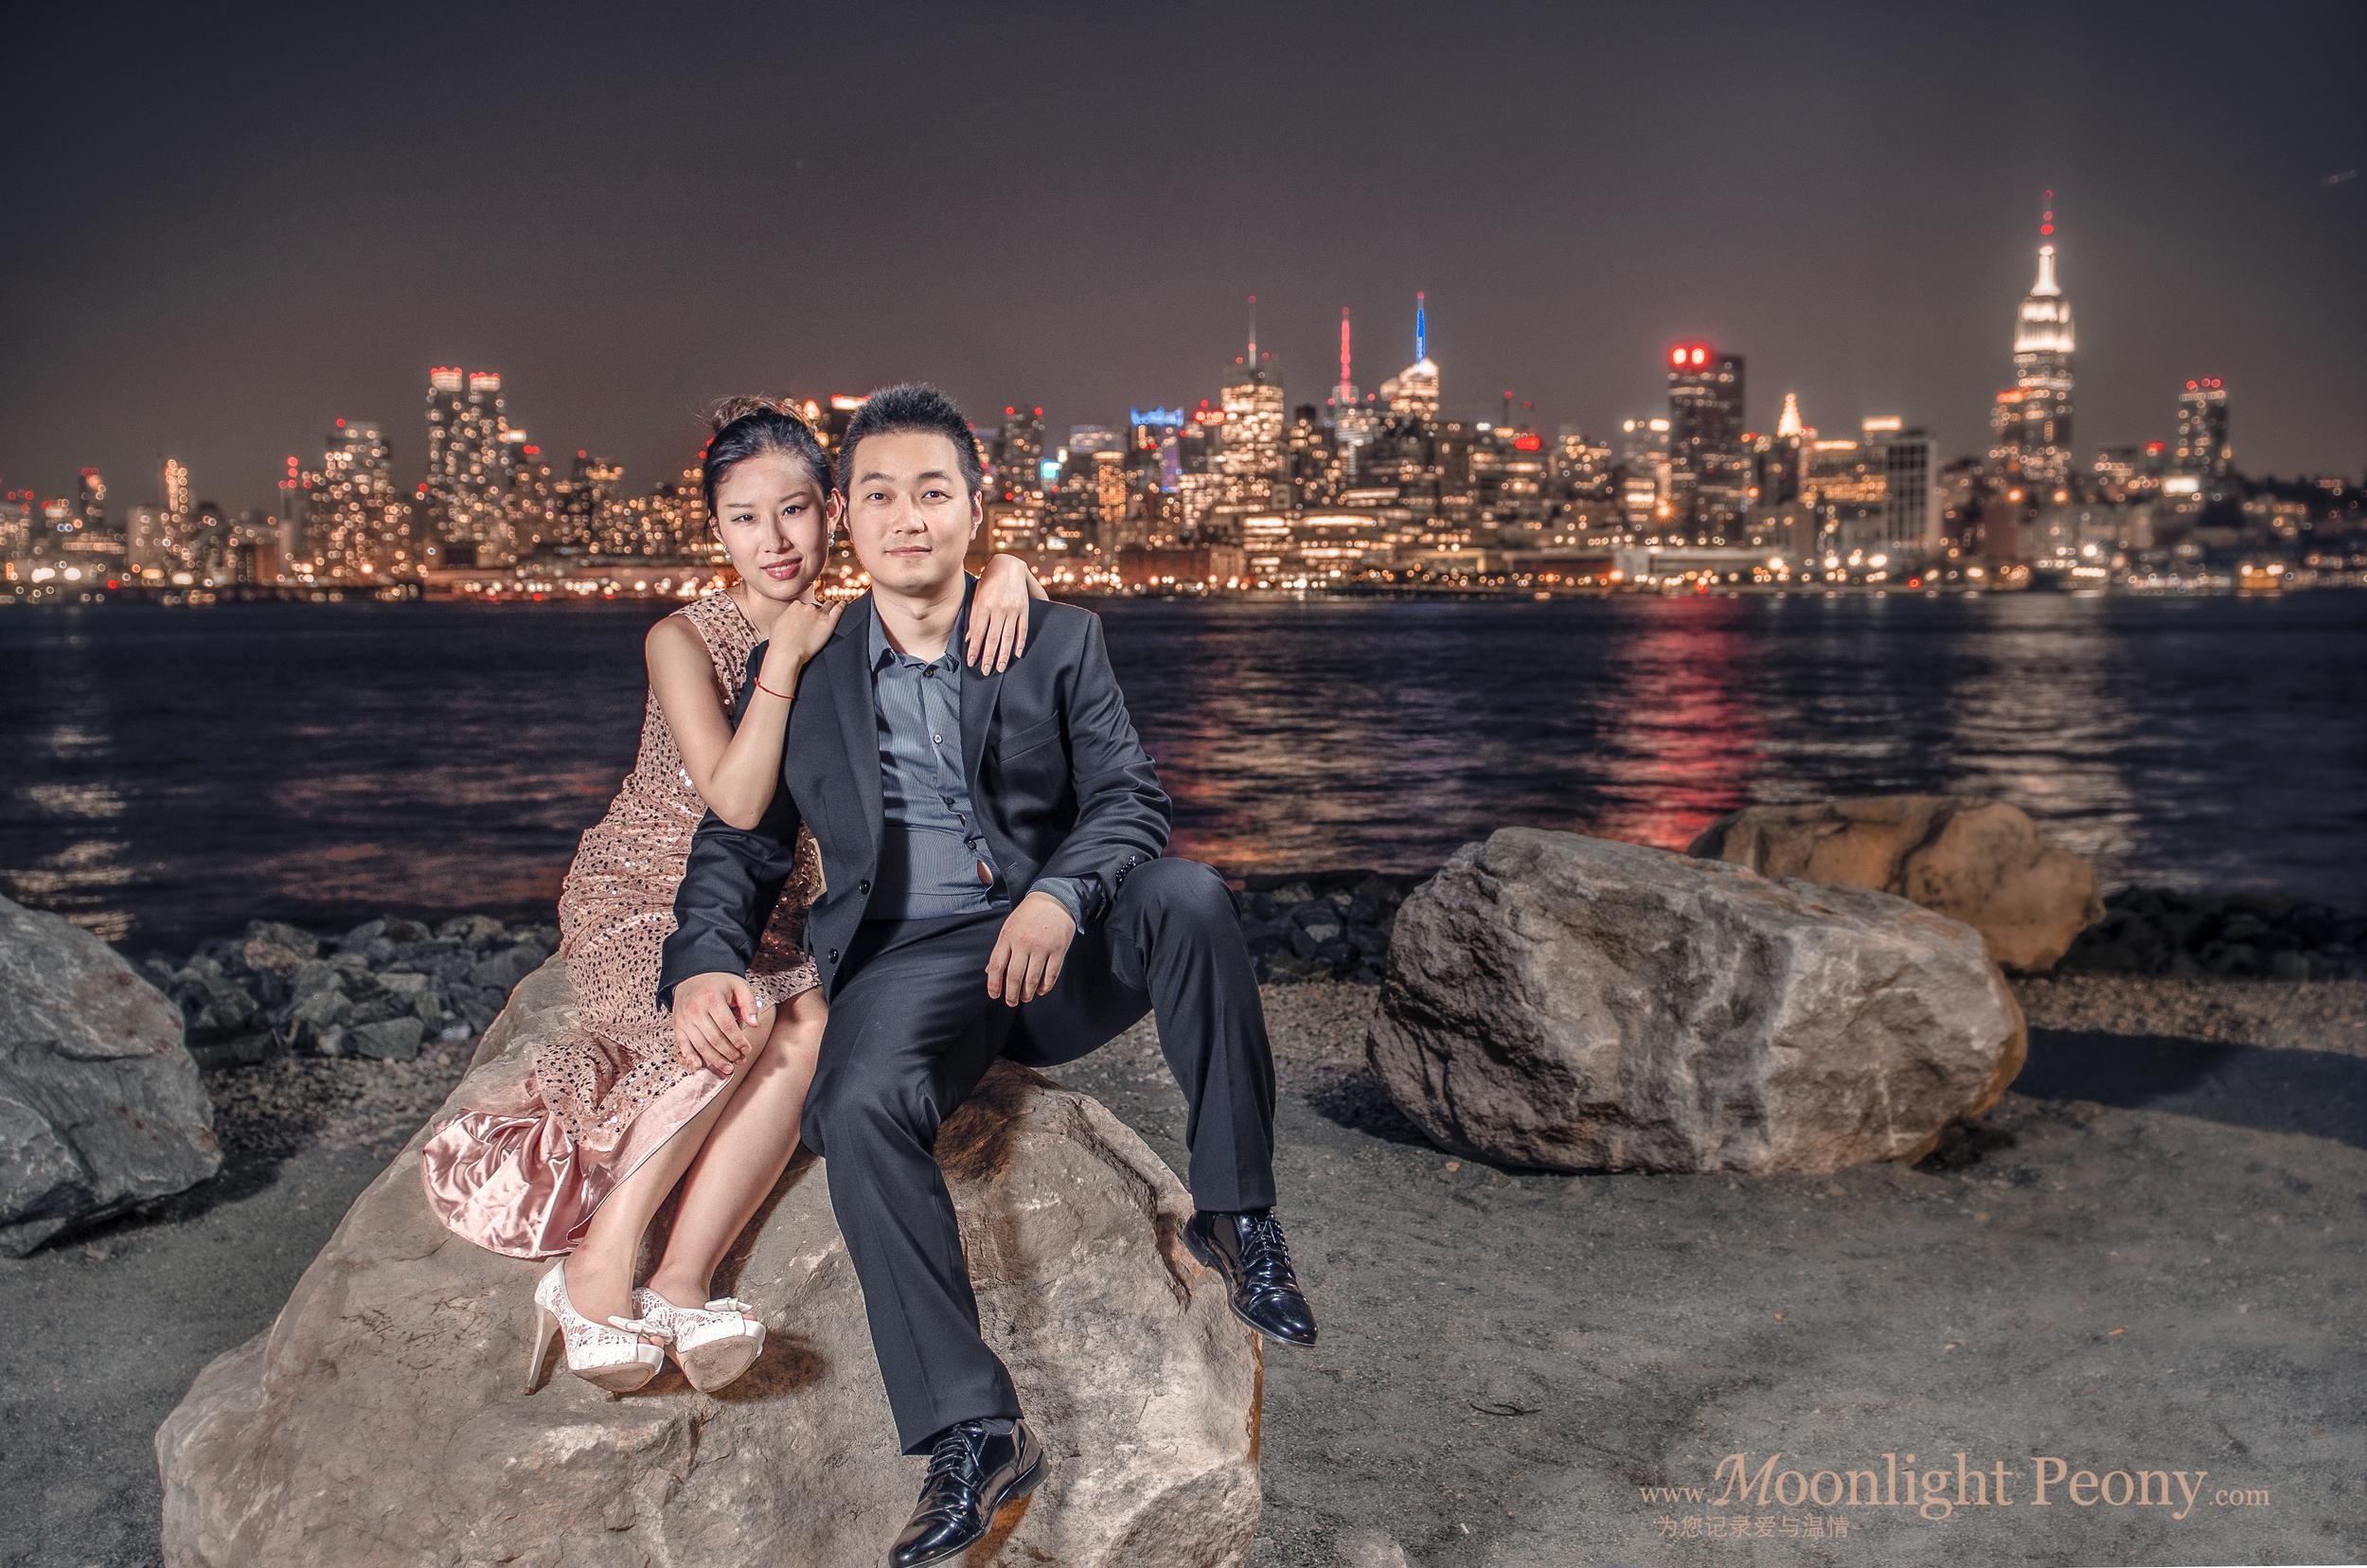 With Watermark wedding-1.jpg